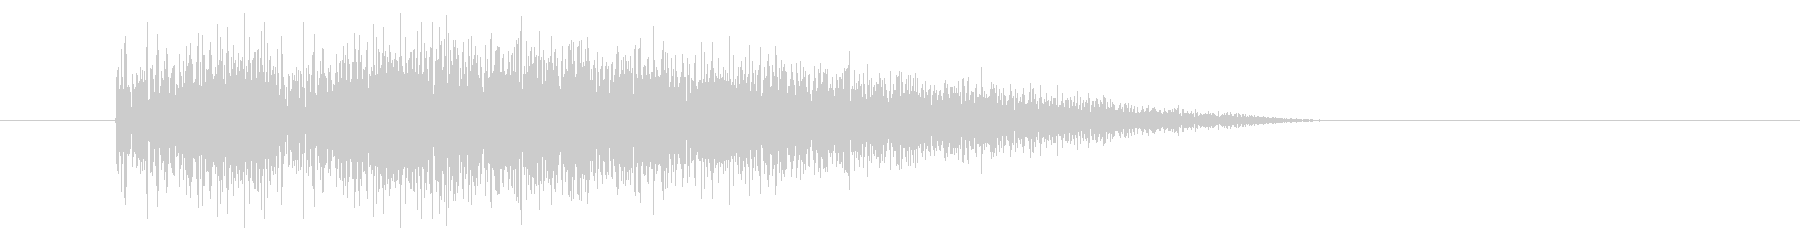 SNES-RPG05-17(エンカウントの未再生の波形